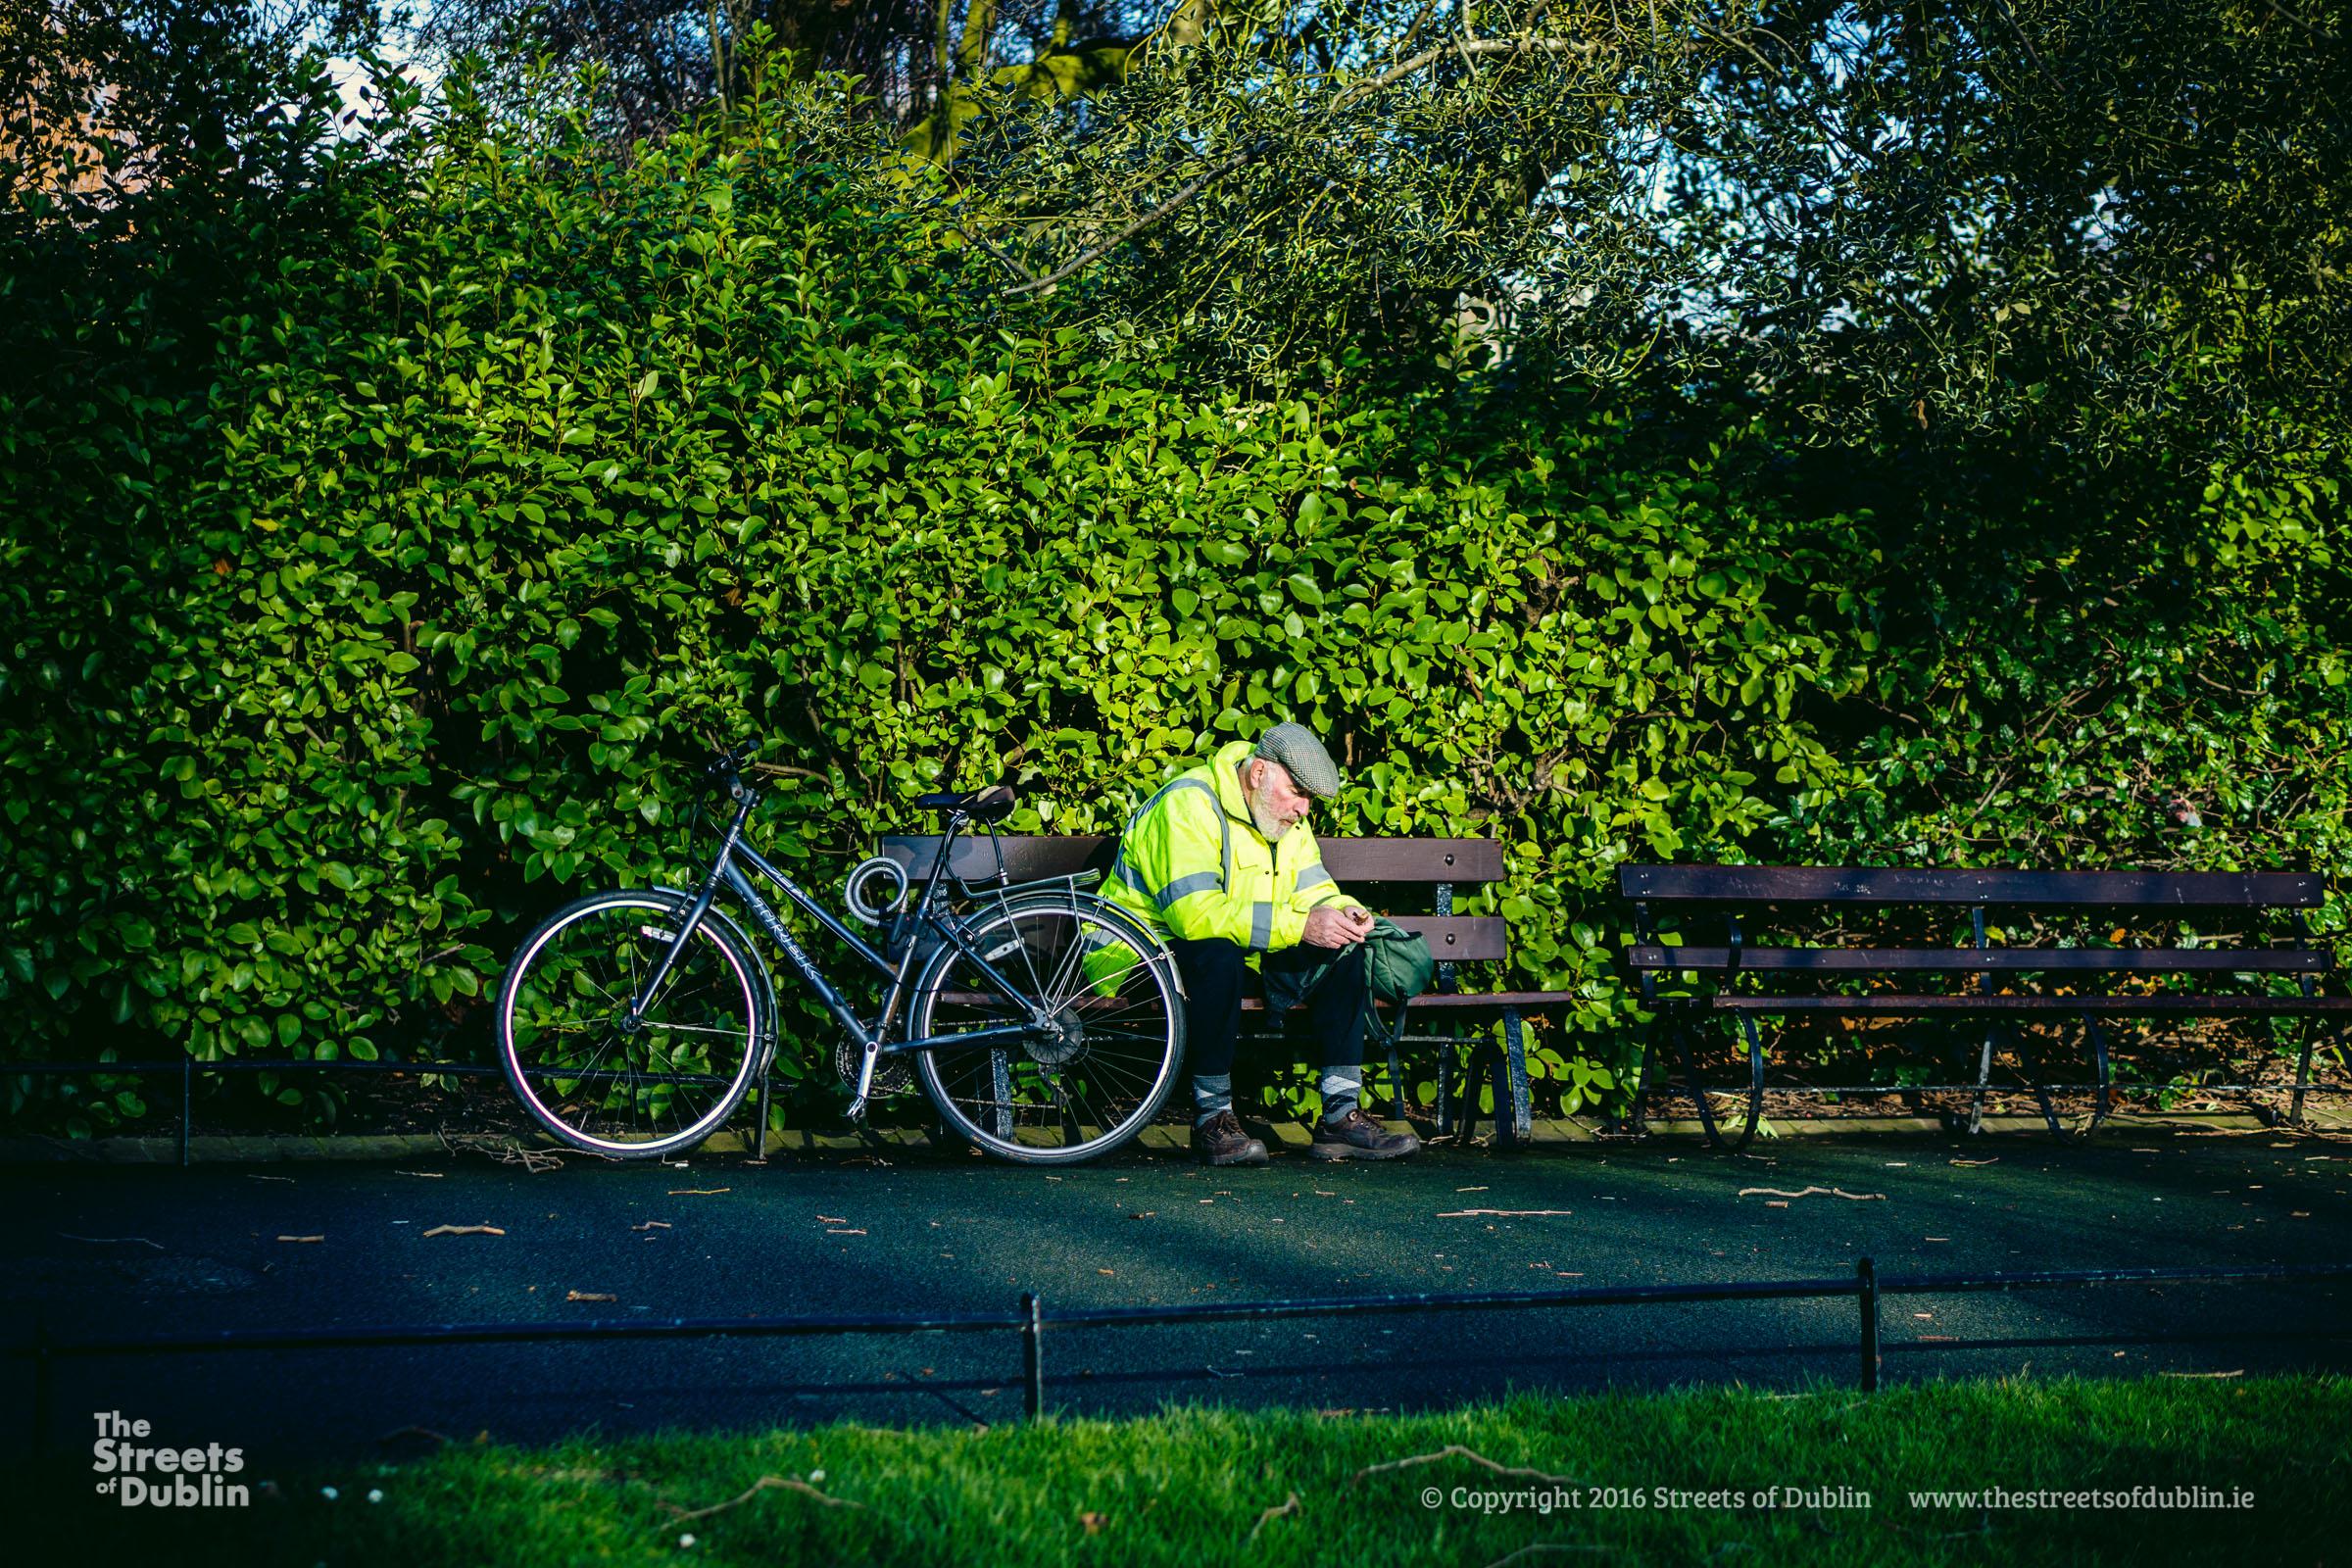 Streets-of-Dublin-Photo-9875.jpg